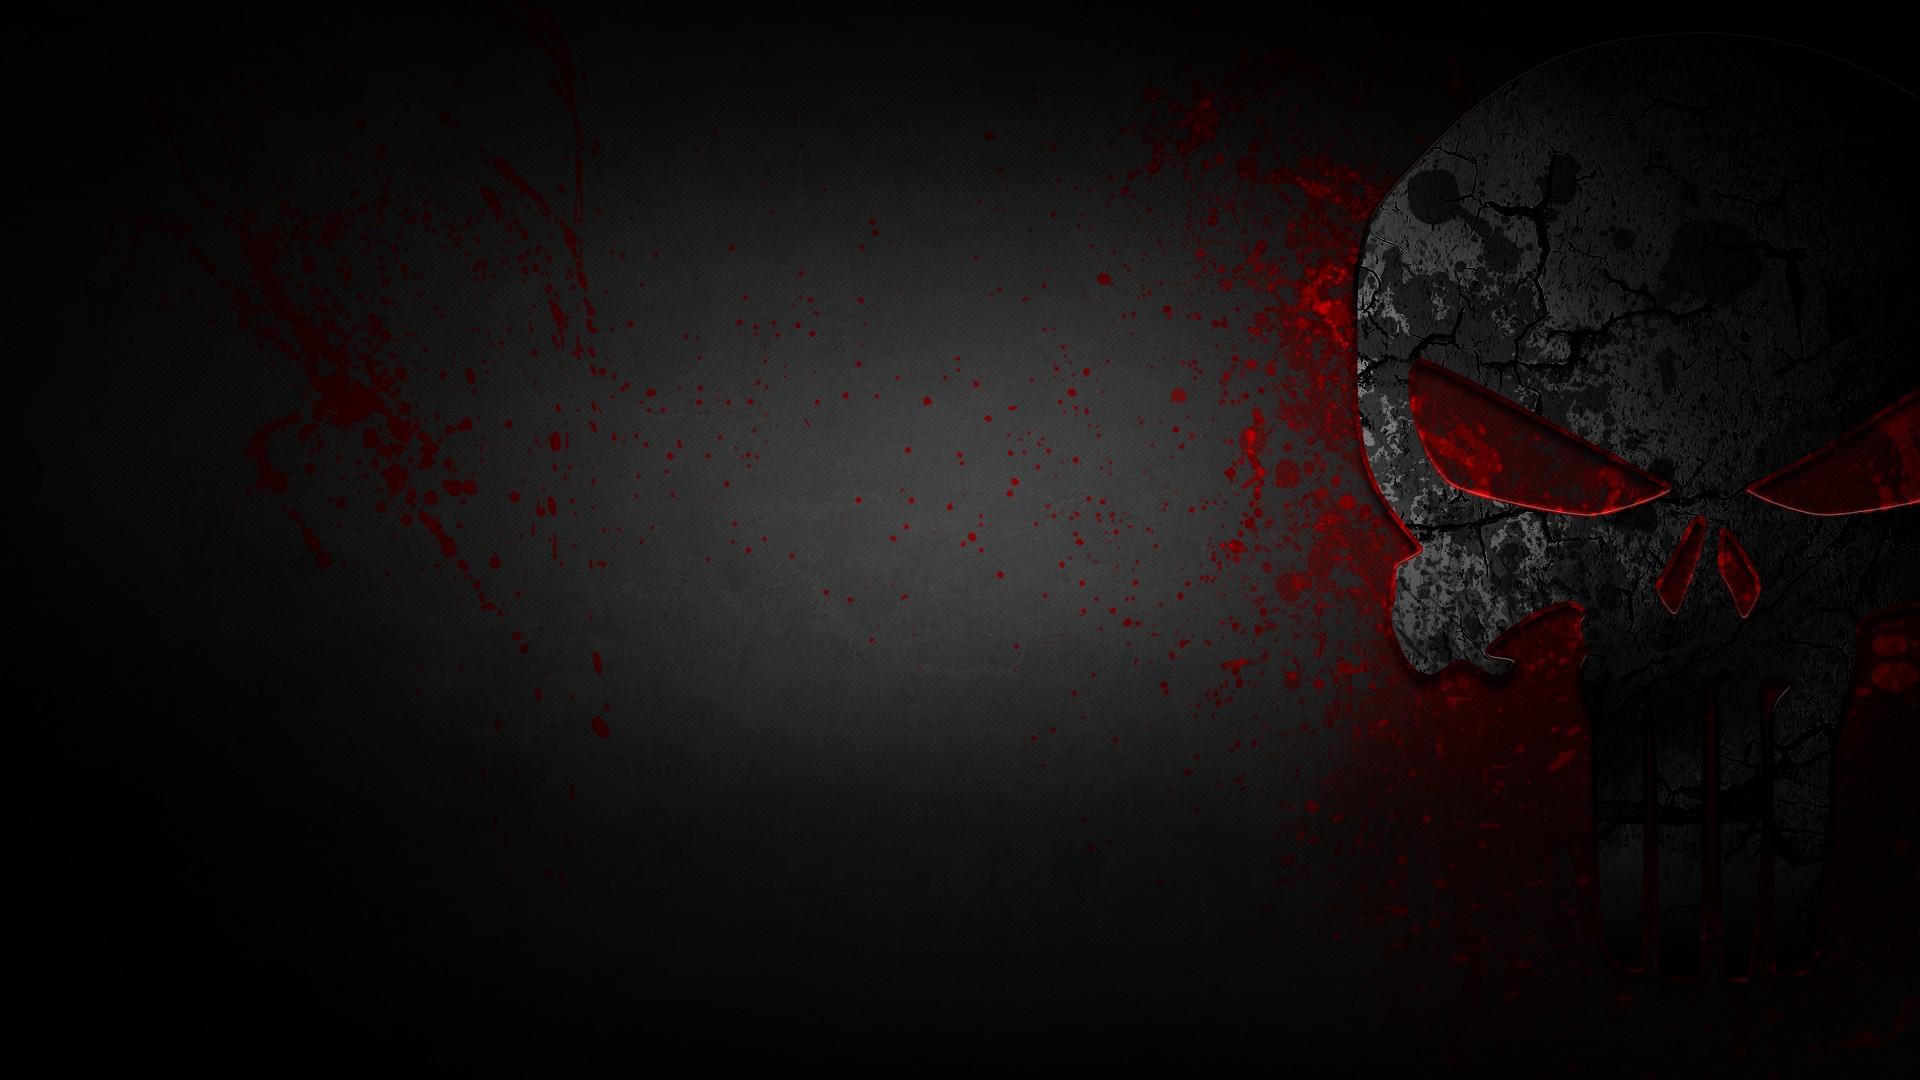 Punisher wallpaper background